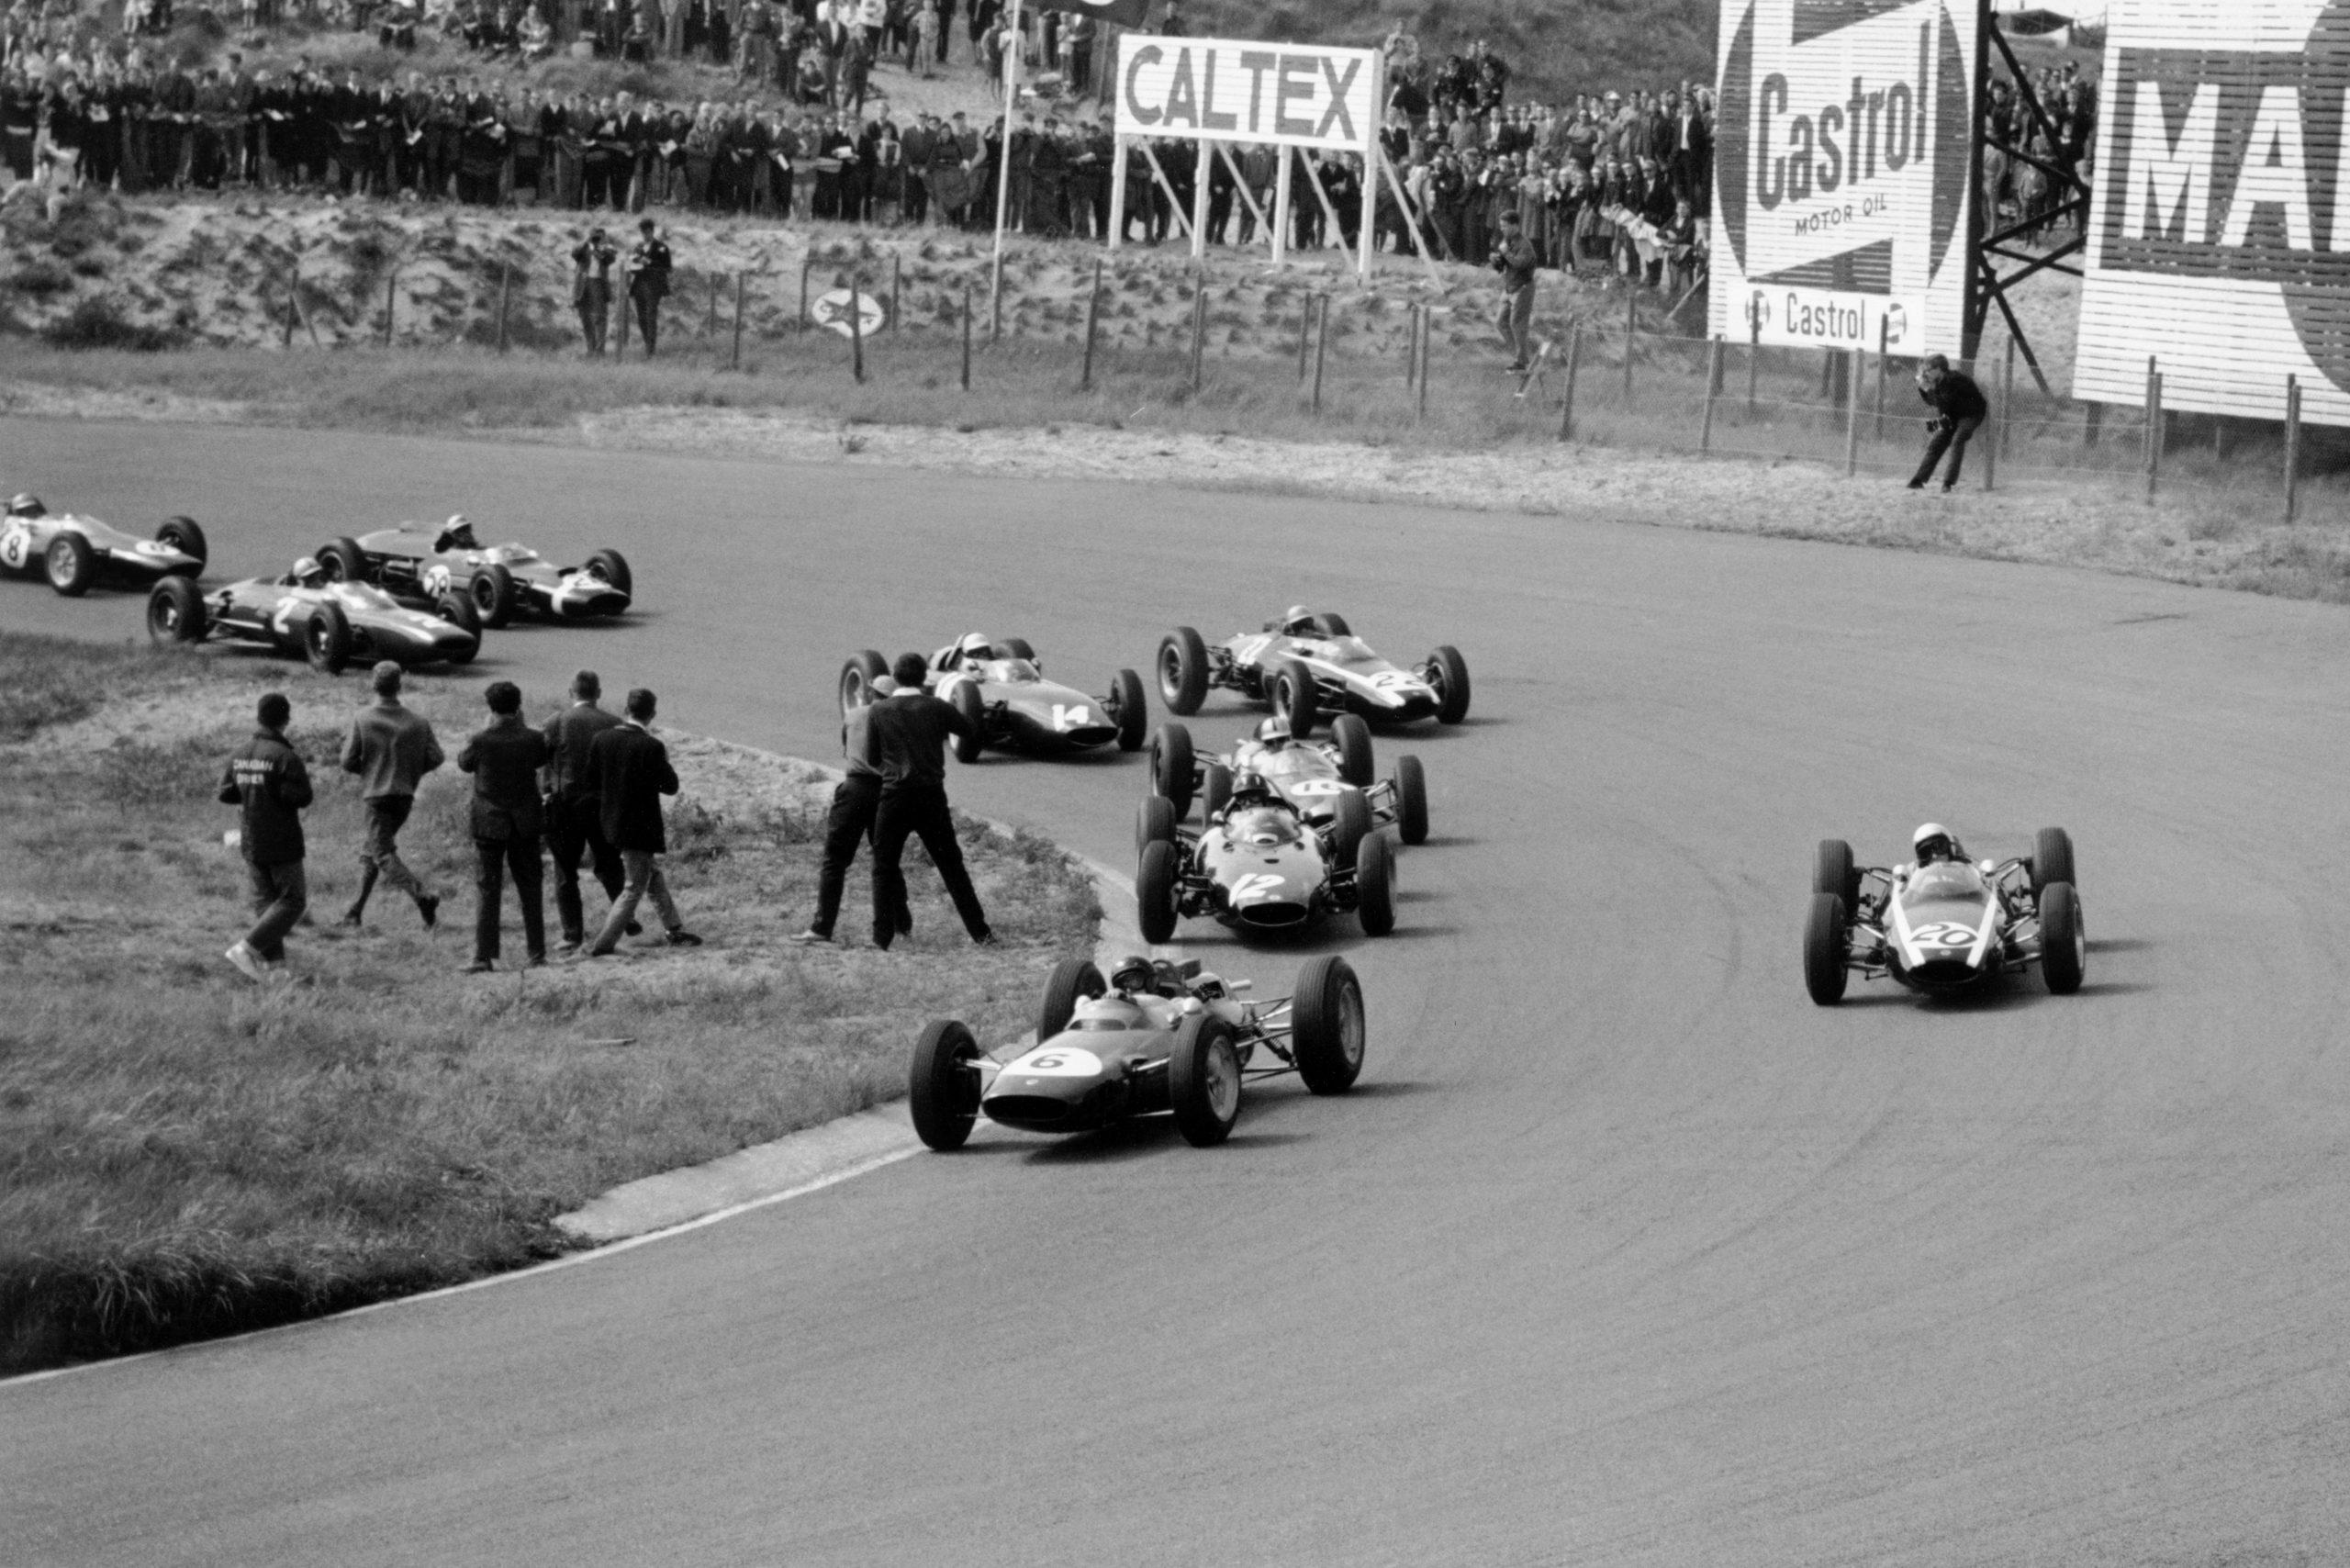 Jim Clark (#6 Lotus 25-Climax) leads Bruce McLaren (#20 Cooper T66-Climax), Graham Hill (#12 BRM P57), Jack Brabham (#16 Brabham BT7-Climax), Tony Maggs (#22 Cooper T66-Climax), Richie Ginther (#14 BRM P57), John Surtees (#2 Ferrari 156), Jo Bonnier (#28 Cooper T60-Climax) and Trevor Taylor (#8 Lotus 25-Climax) into Tarzan Corner at the start.